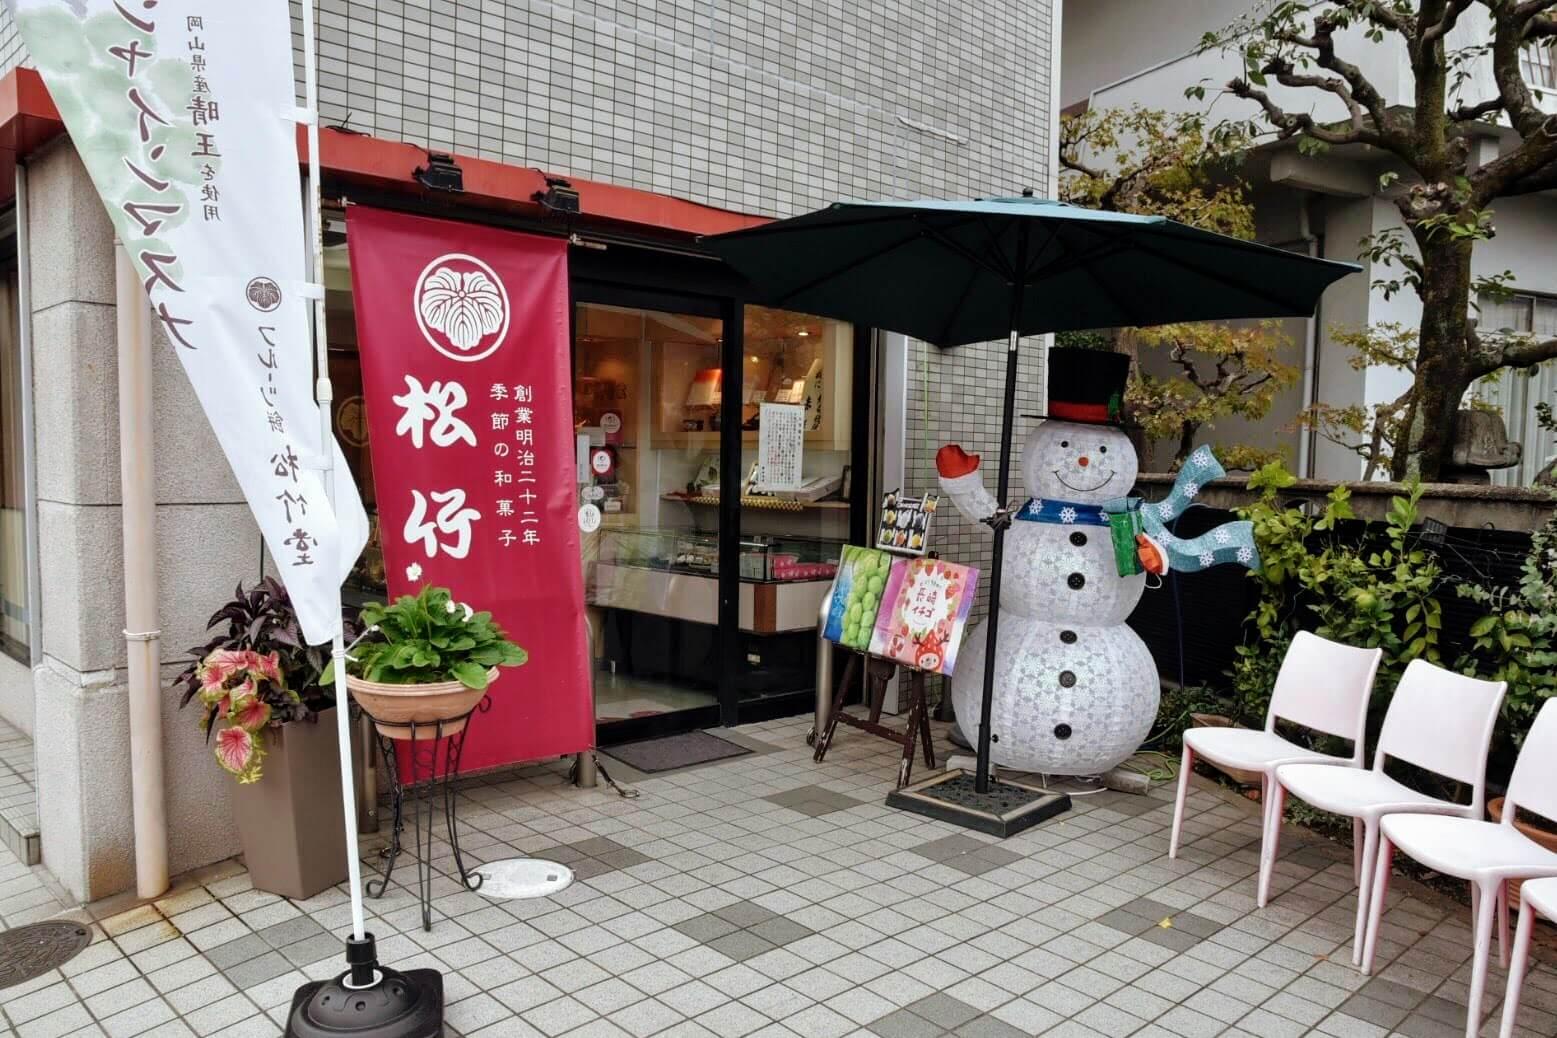 『松竹堂 吹田山田本店』の入口